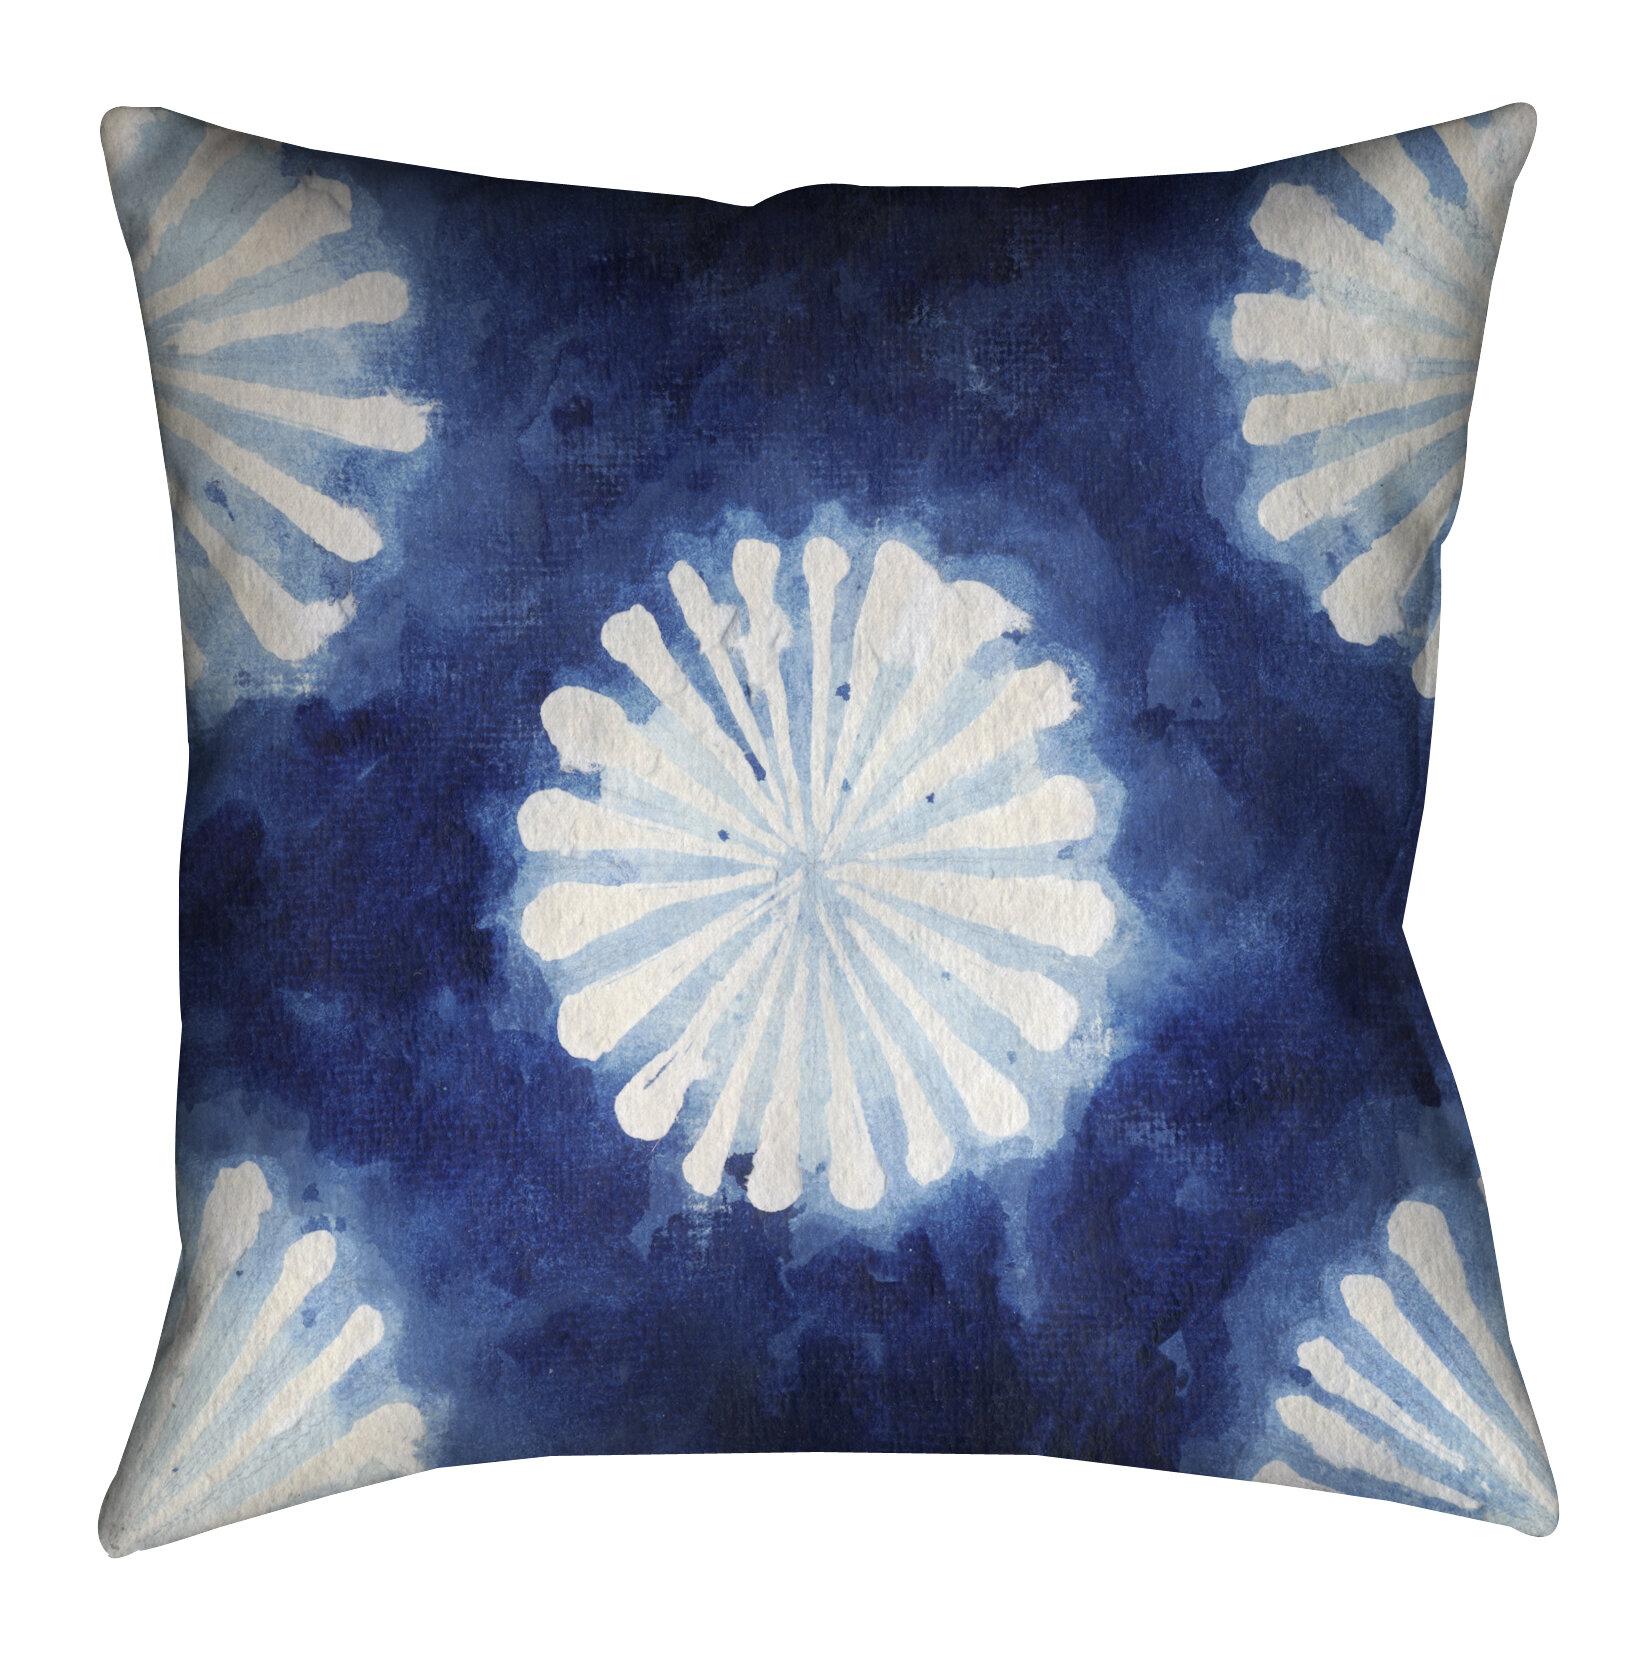 Lauralhome Brasher Shibori Iii Outdoor Throw Pillow Wayfair